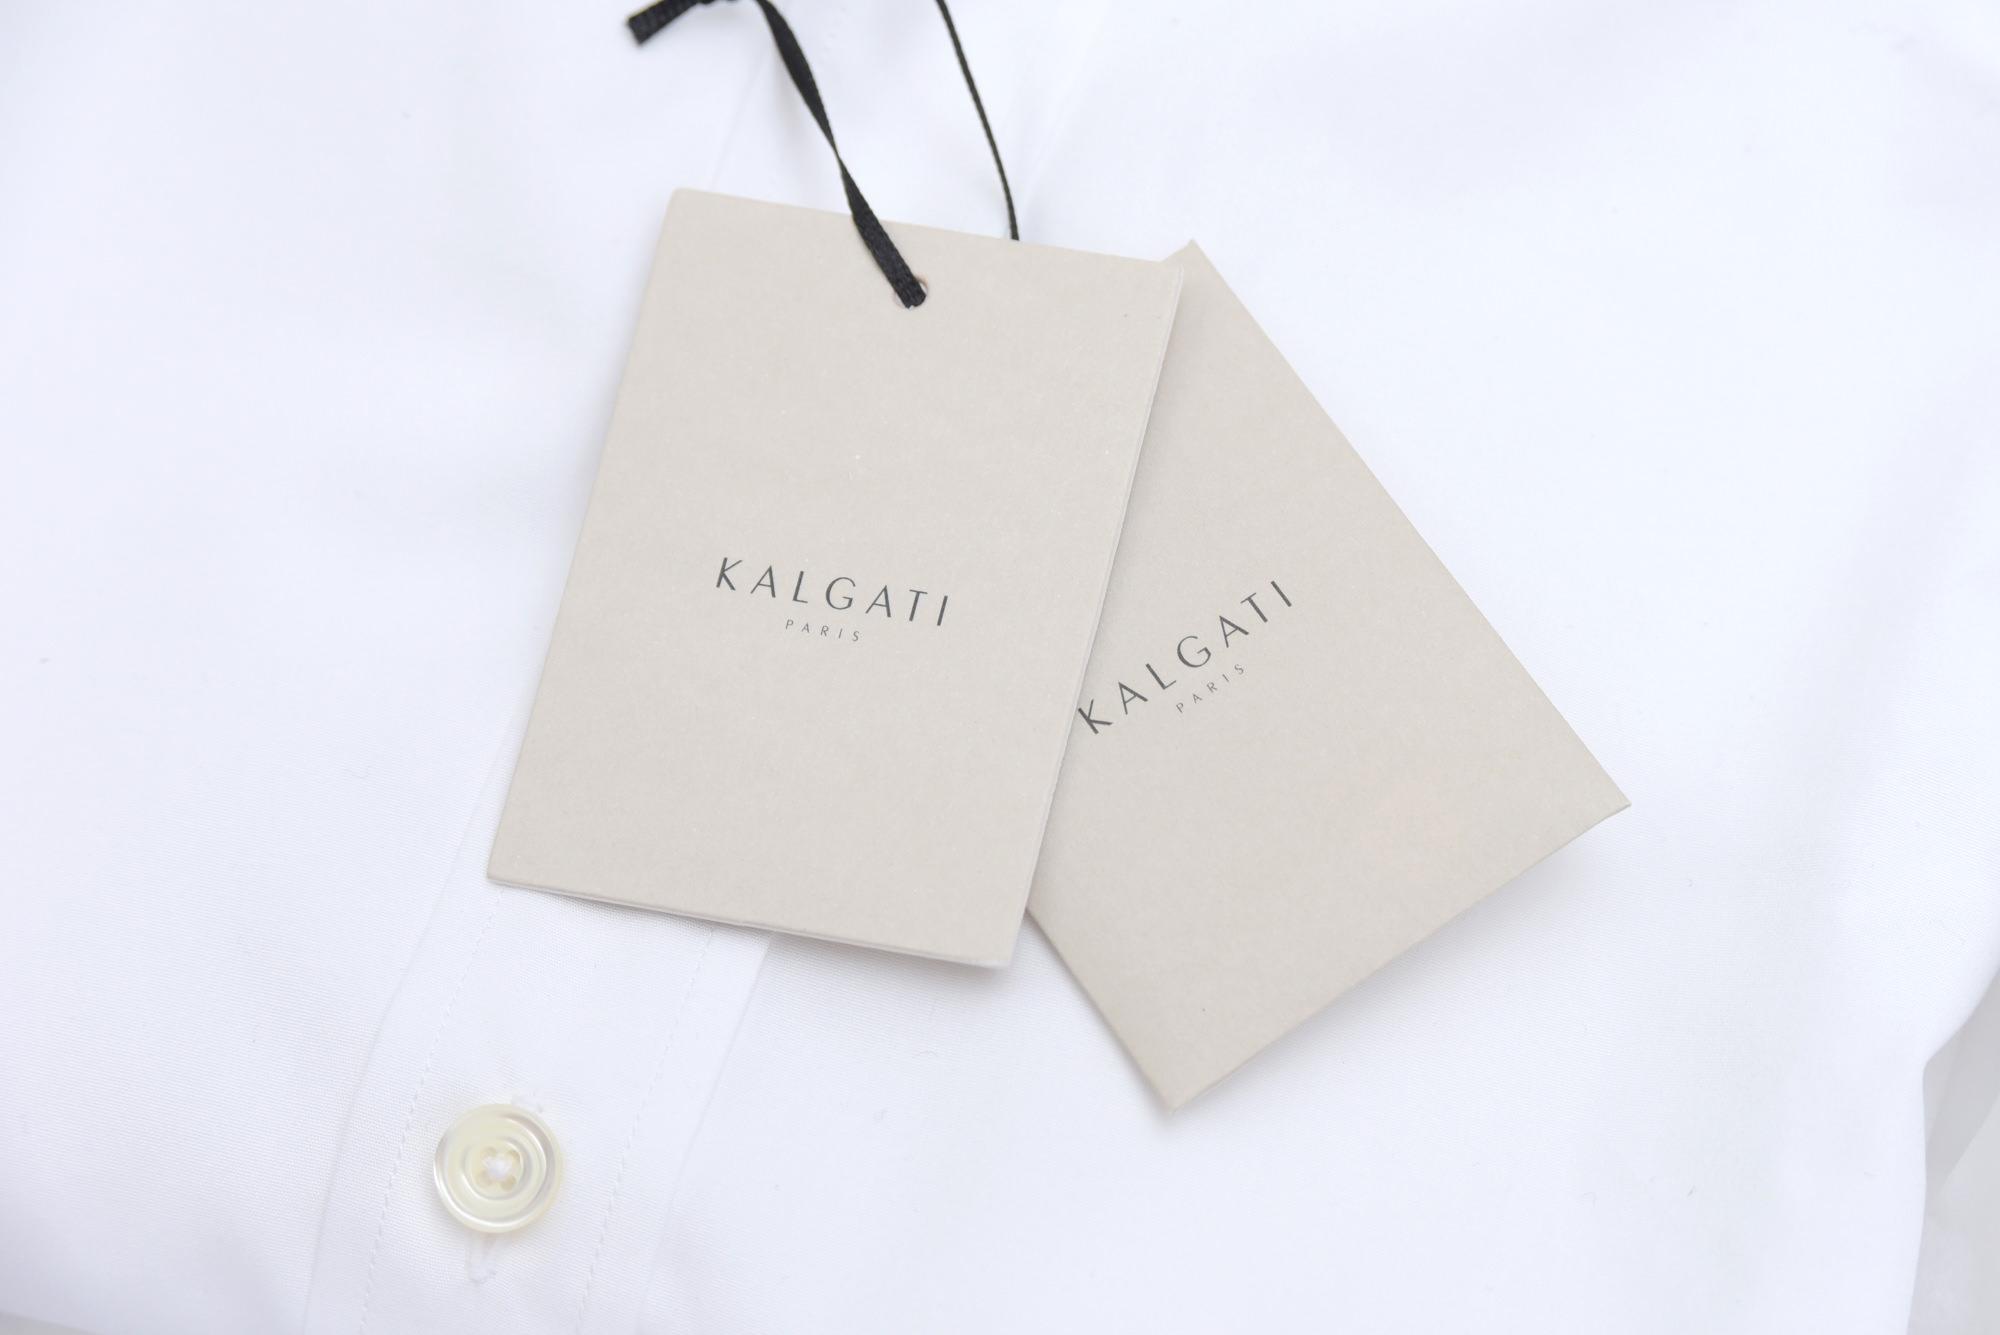 kalgati-x-verygoodlord-26-sur-27